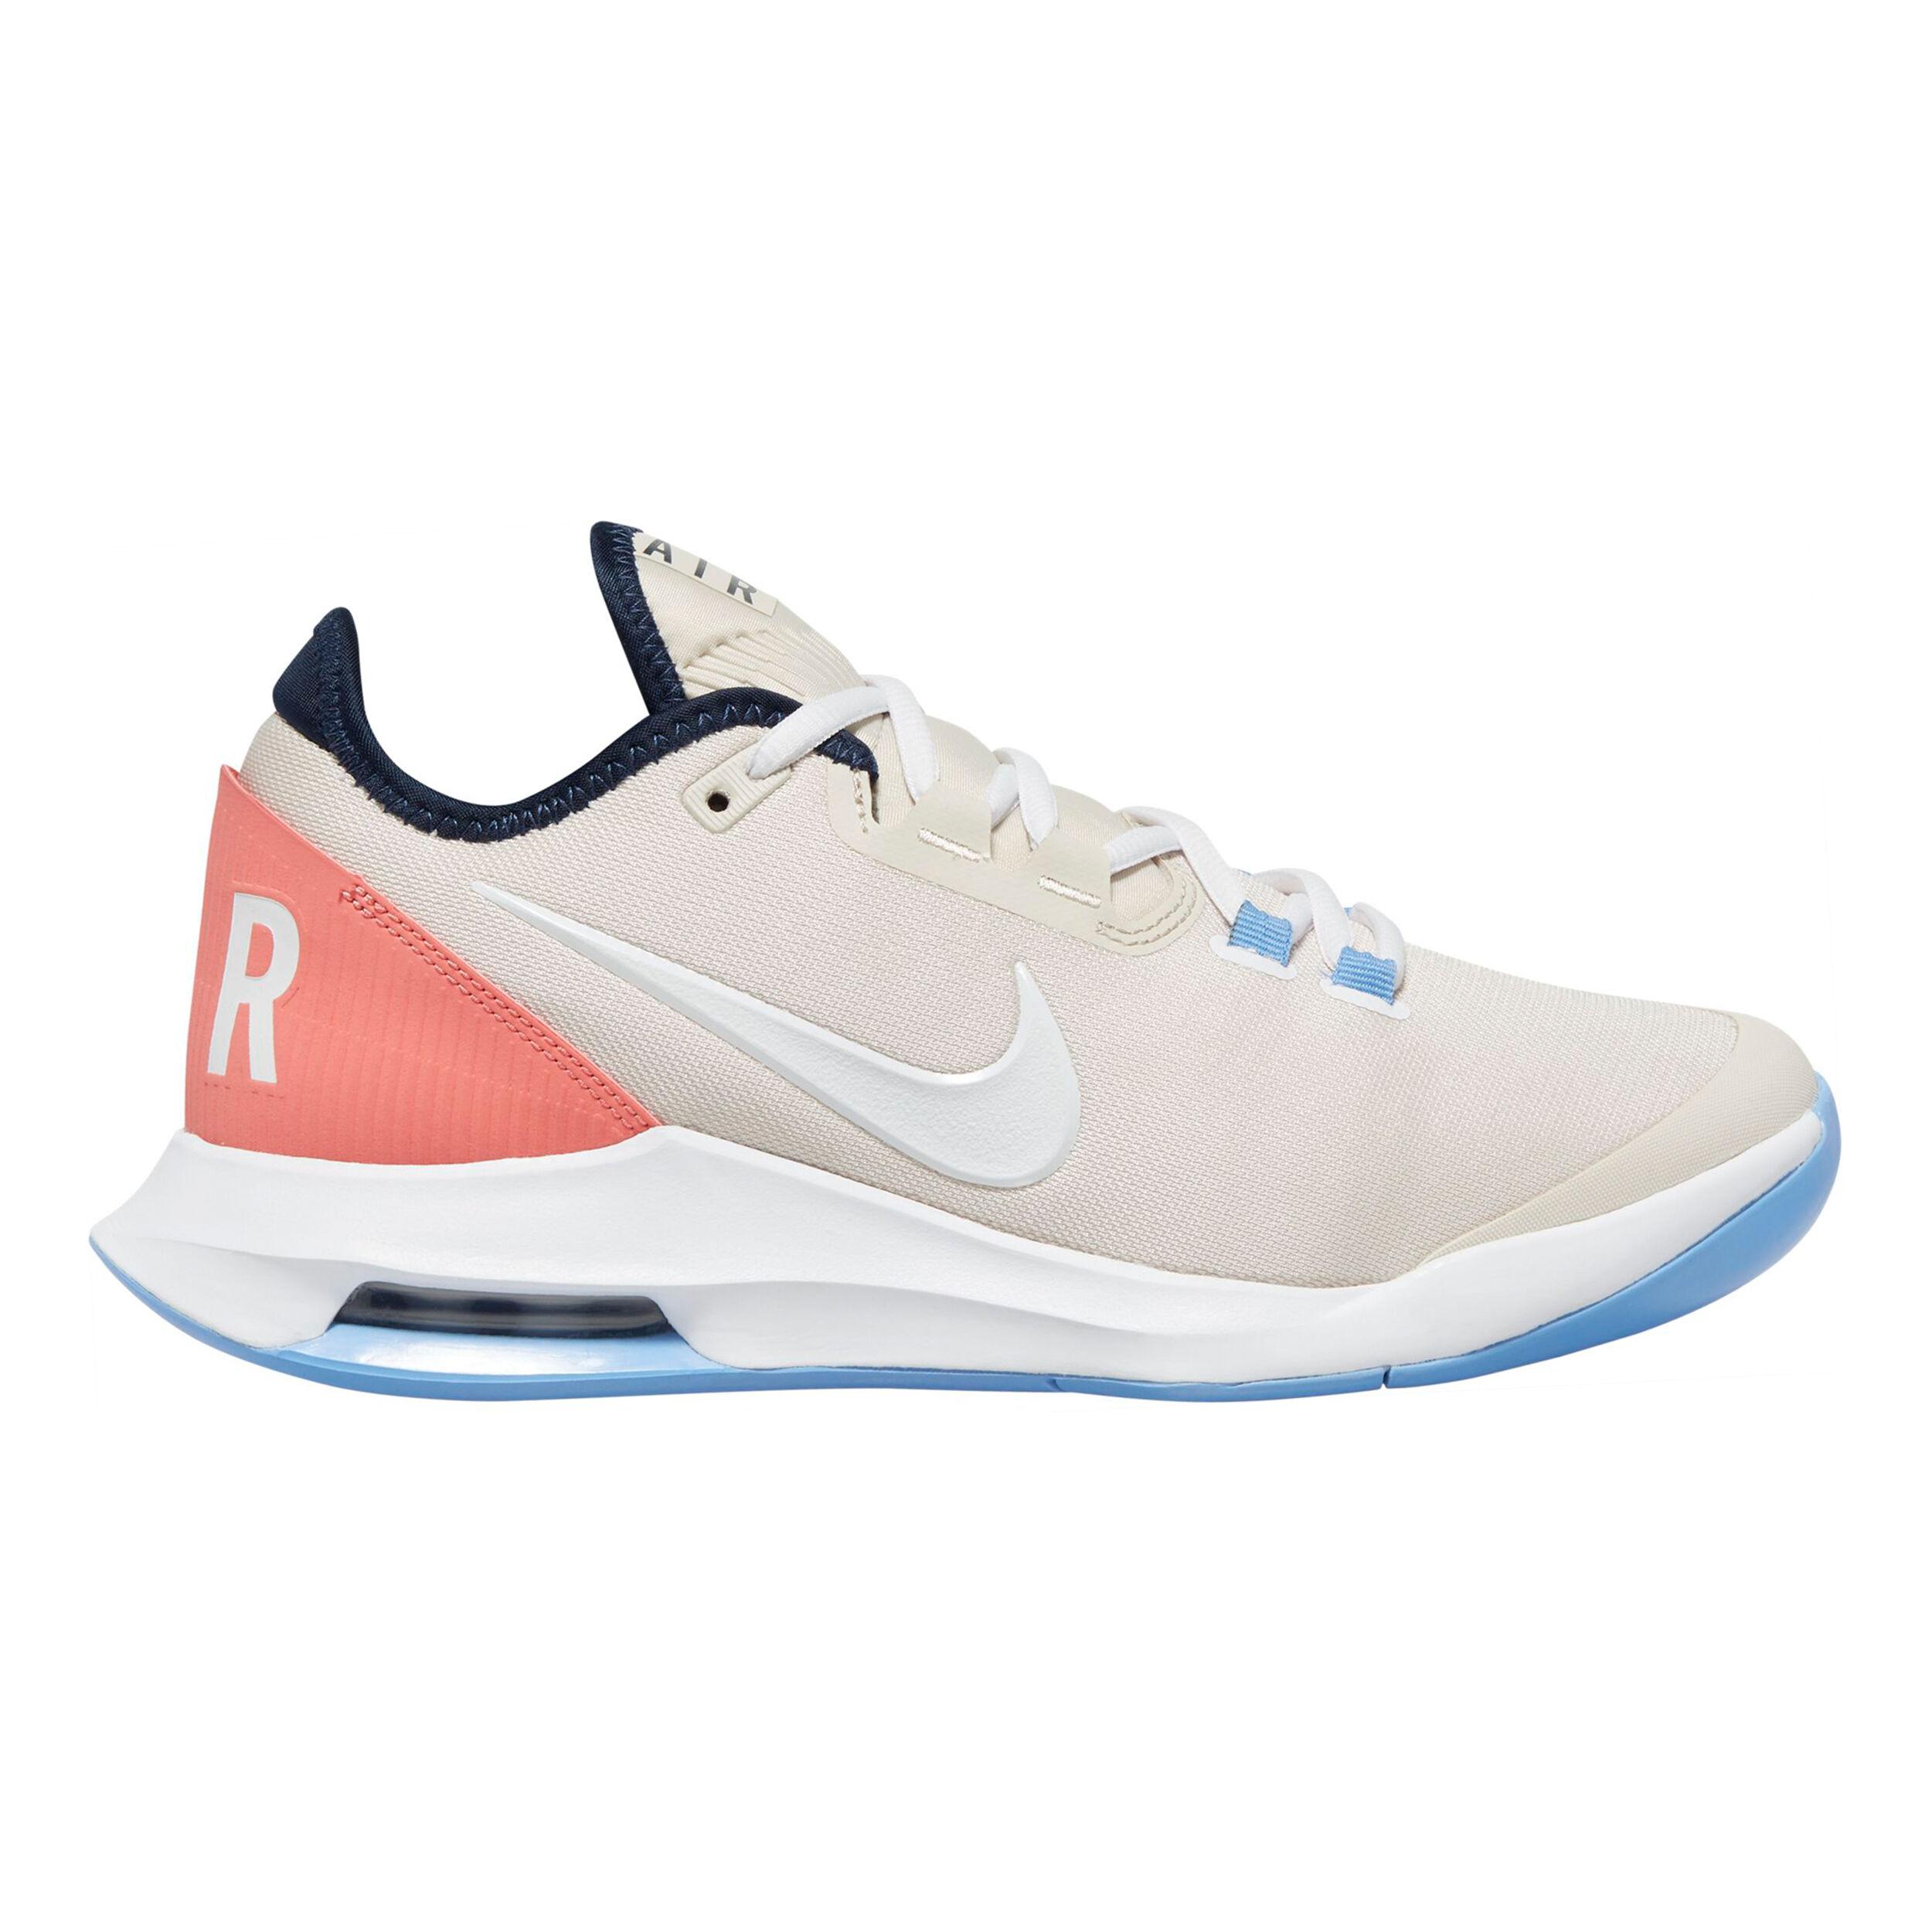 Nike Air Max Wildcard Scarpa Per Tutte Le Superfici Donna  qOR4h8